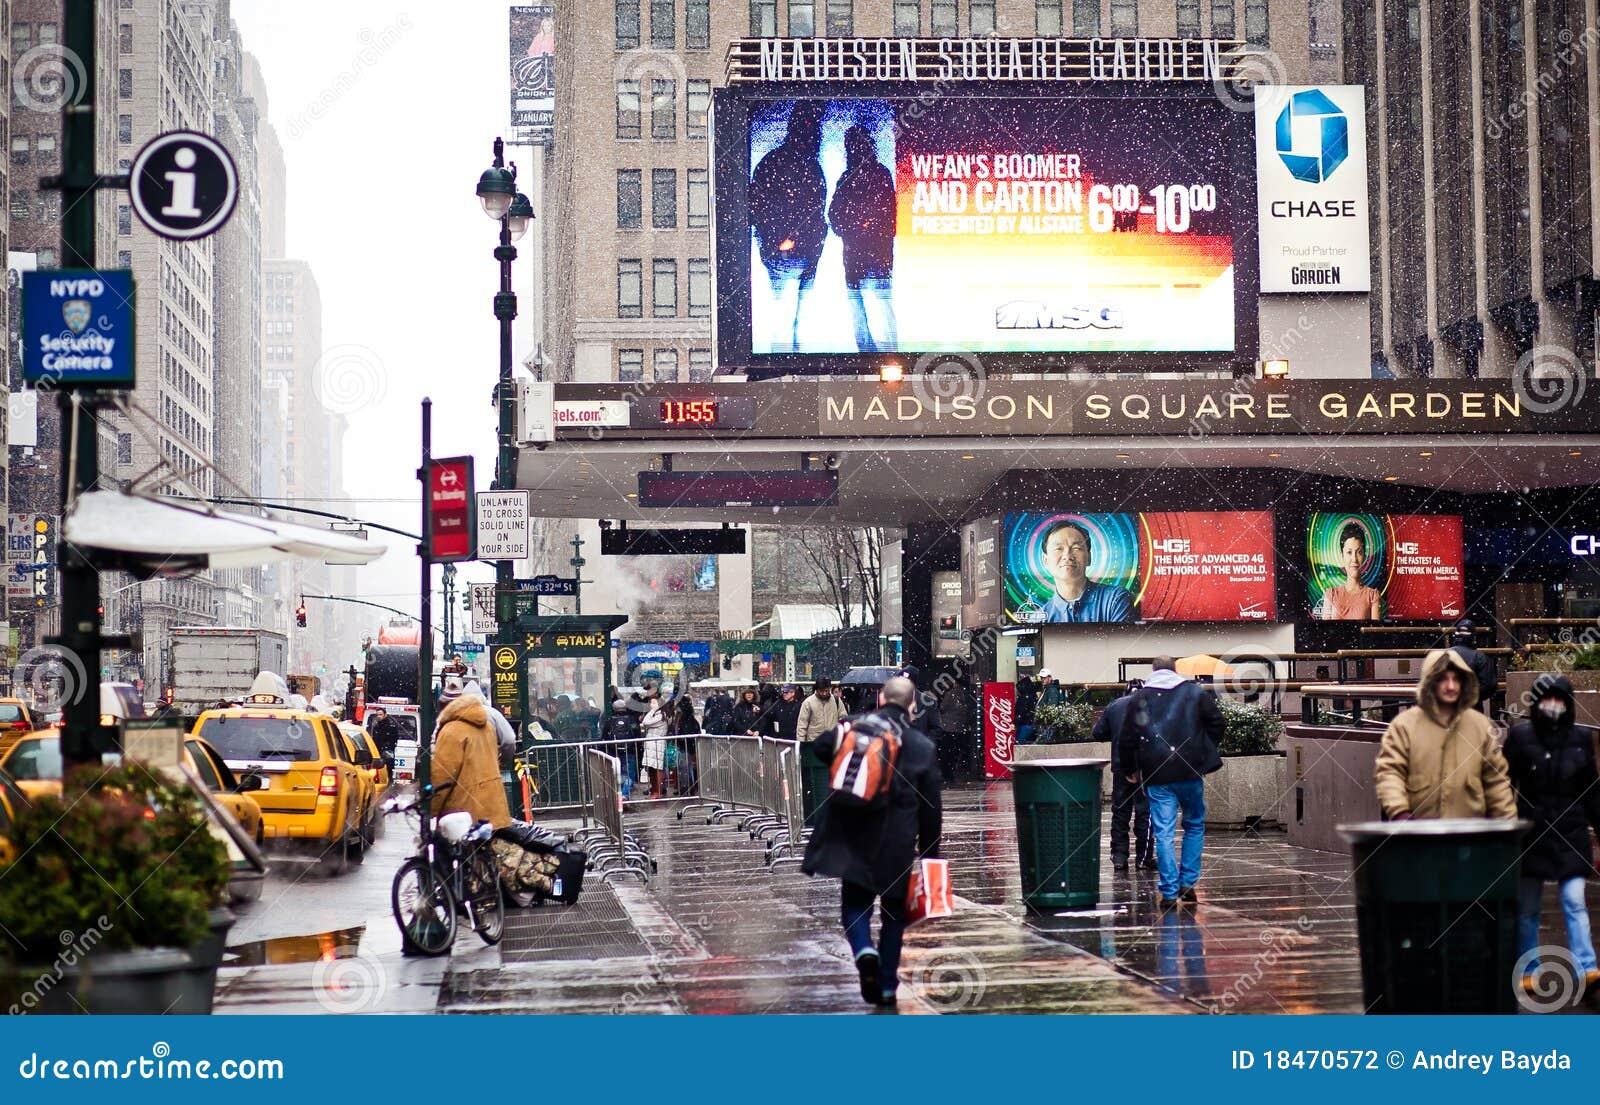 Madison Square Garden Im Blizzard Redaktionelles Stockfotografie Bild 18470572